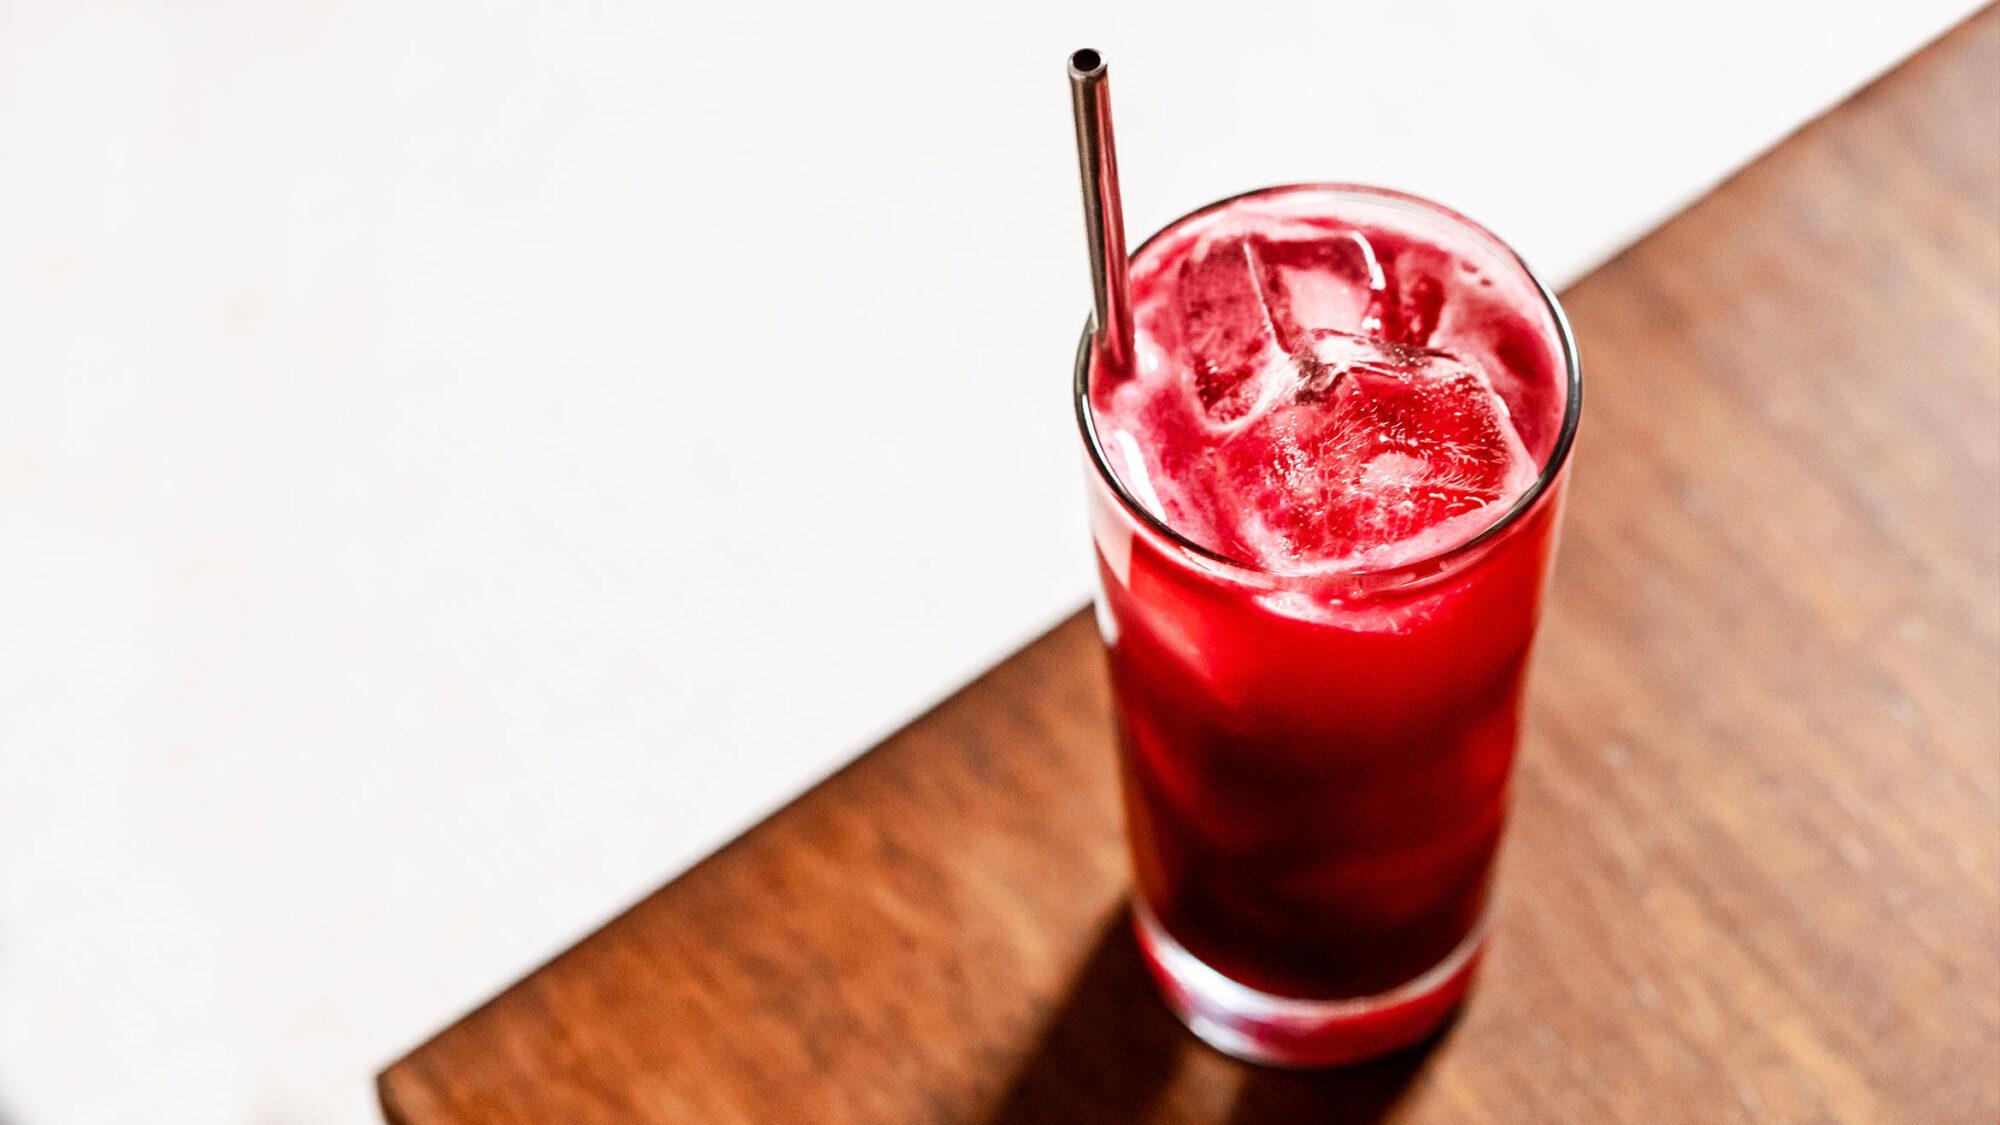 Article-Agua-de-Jamaica-Hibiscus-Pineapple-Tea-Punch-Recipe